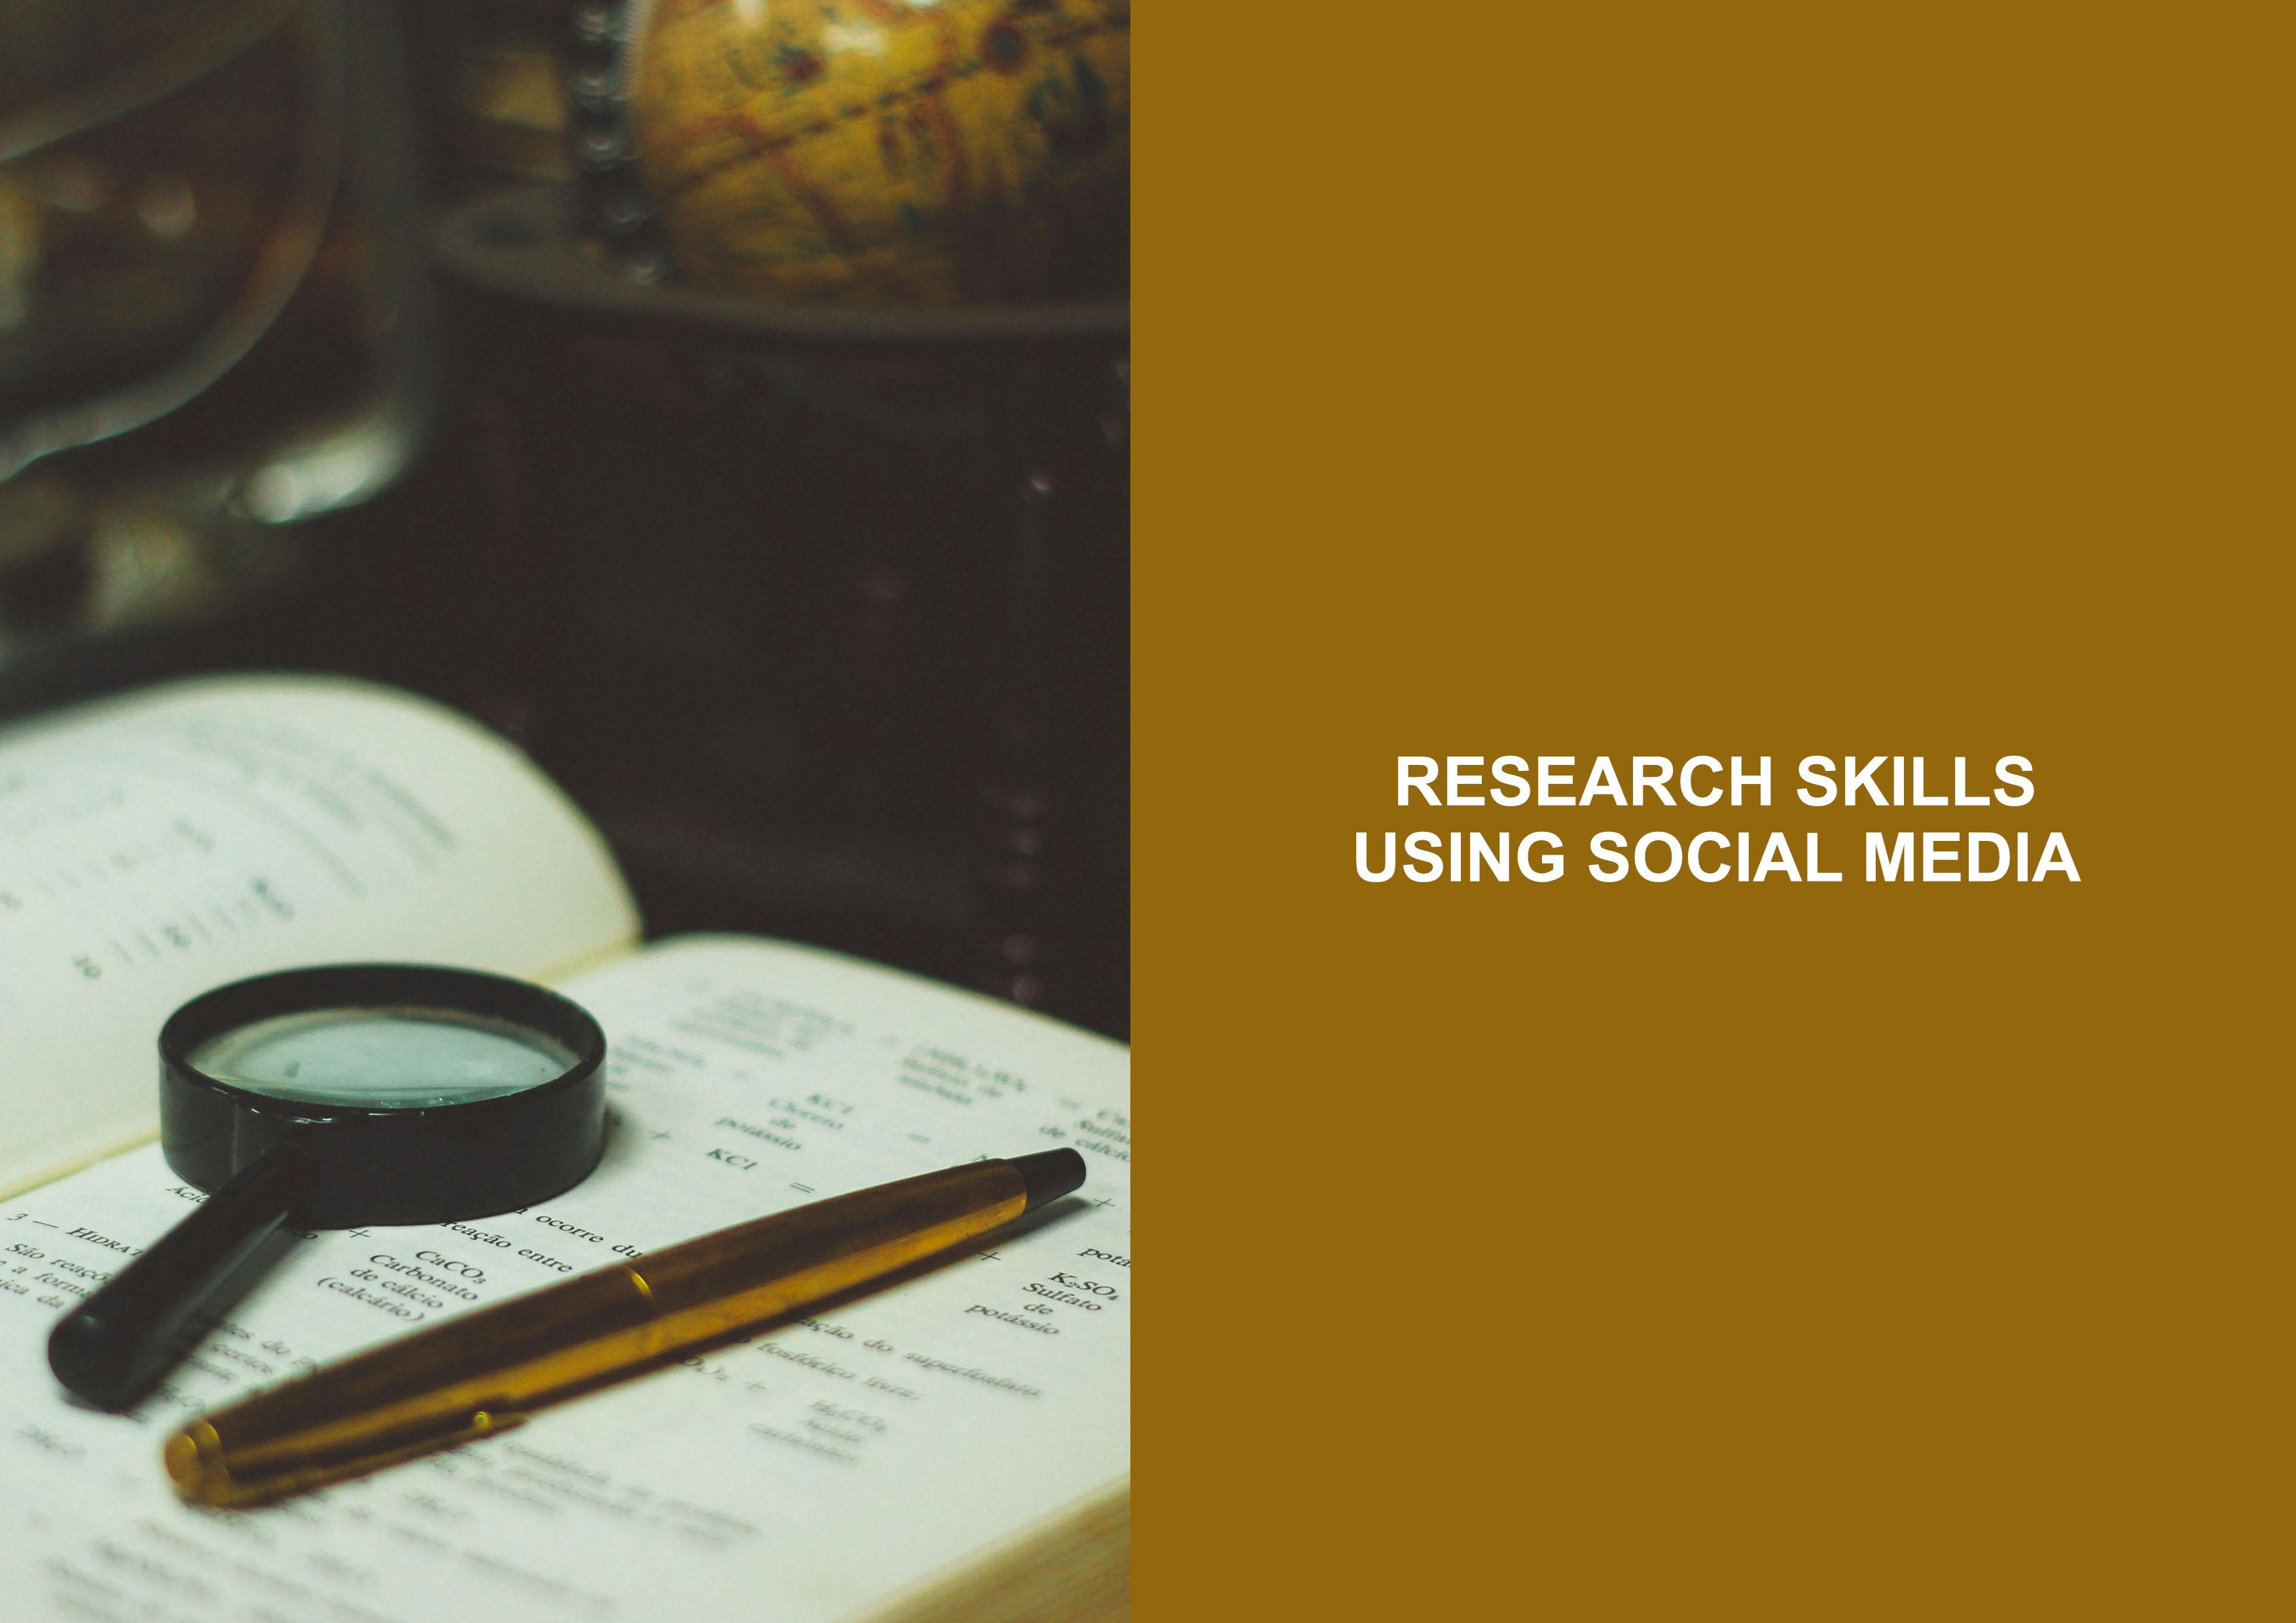 Research Skills Using Social Media